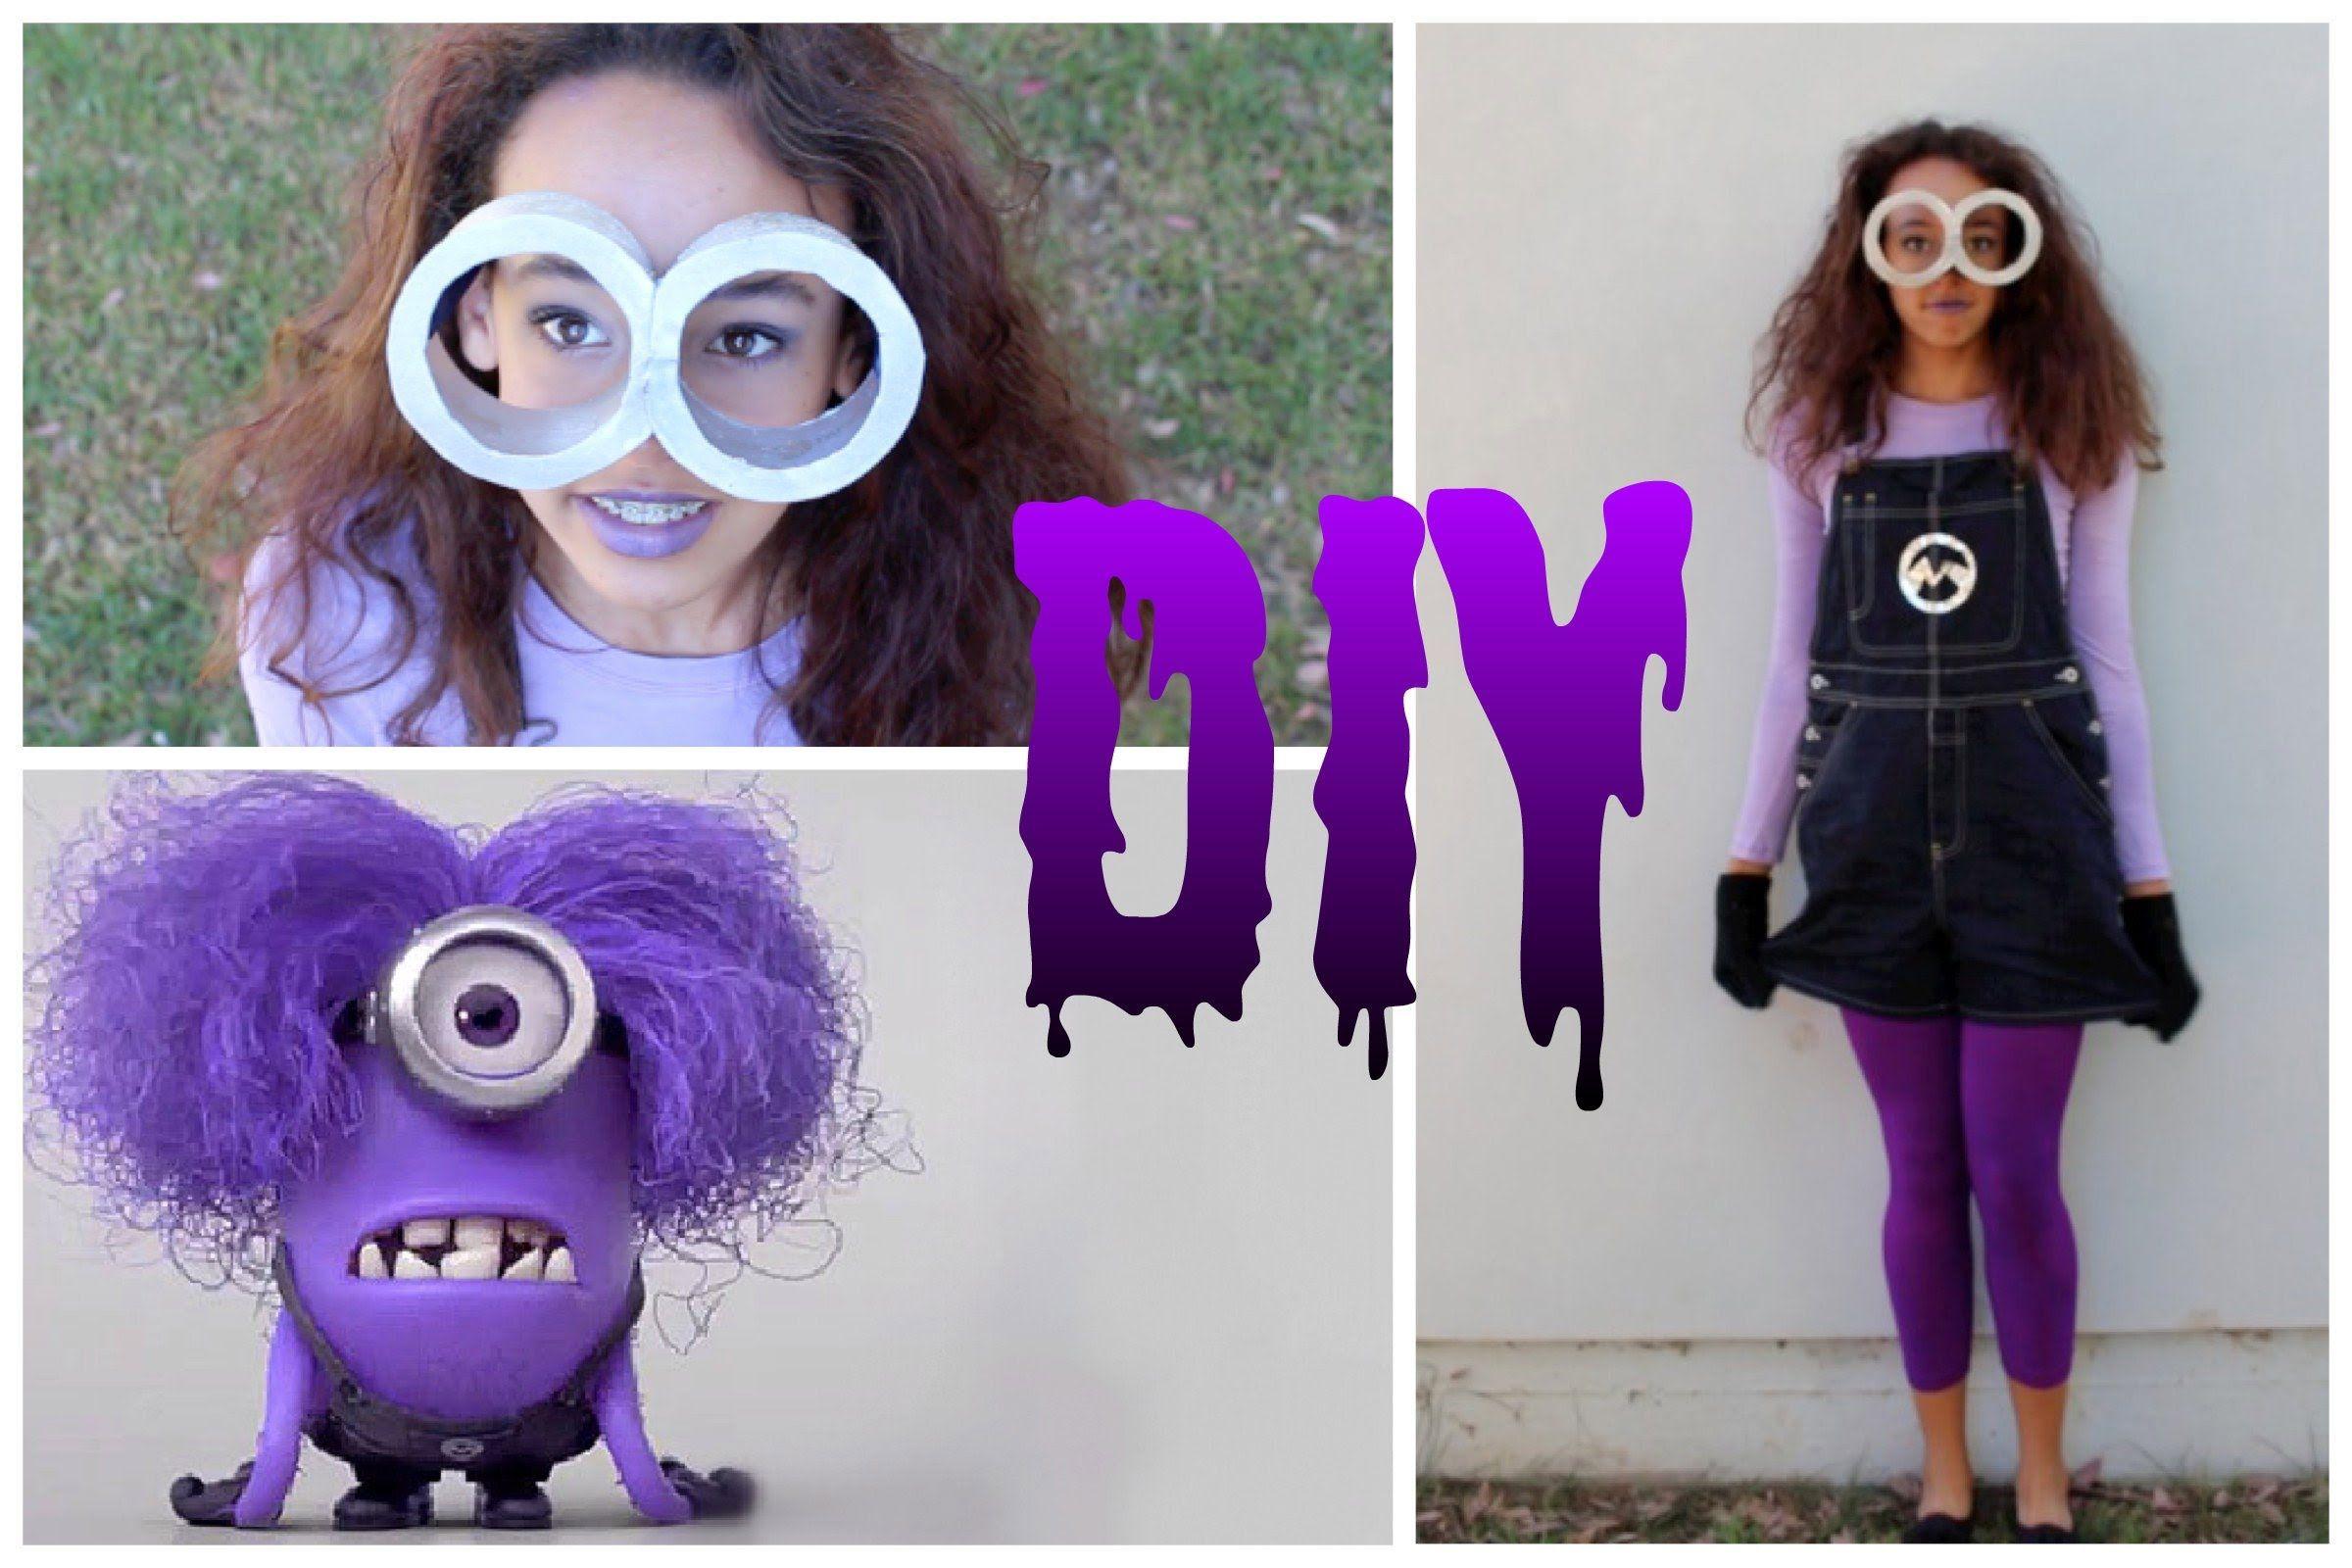 Diy Purple Minion Costume Makeup Hair Purple Minion Costume Minion Costumes Purple Minions